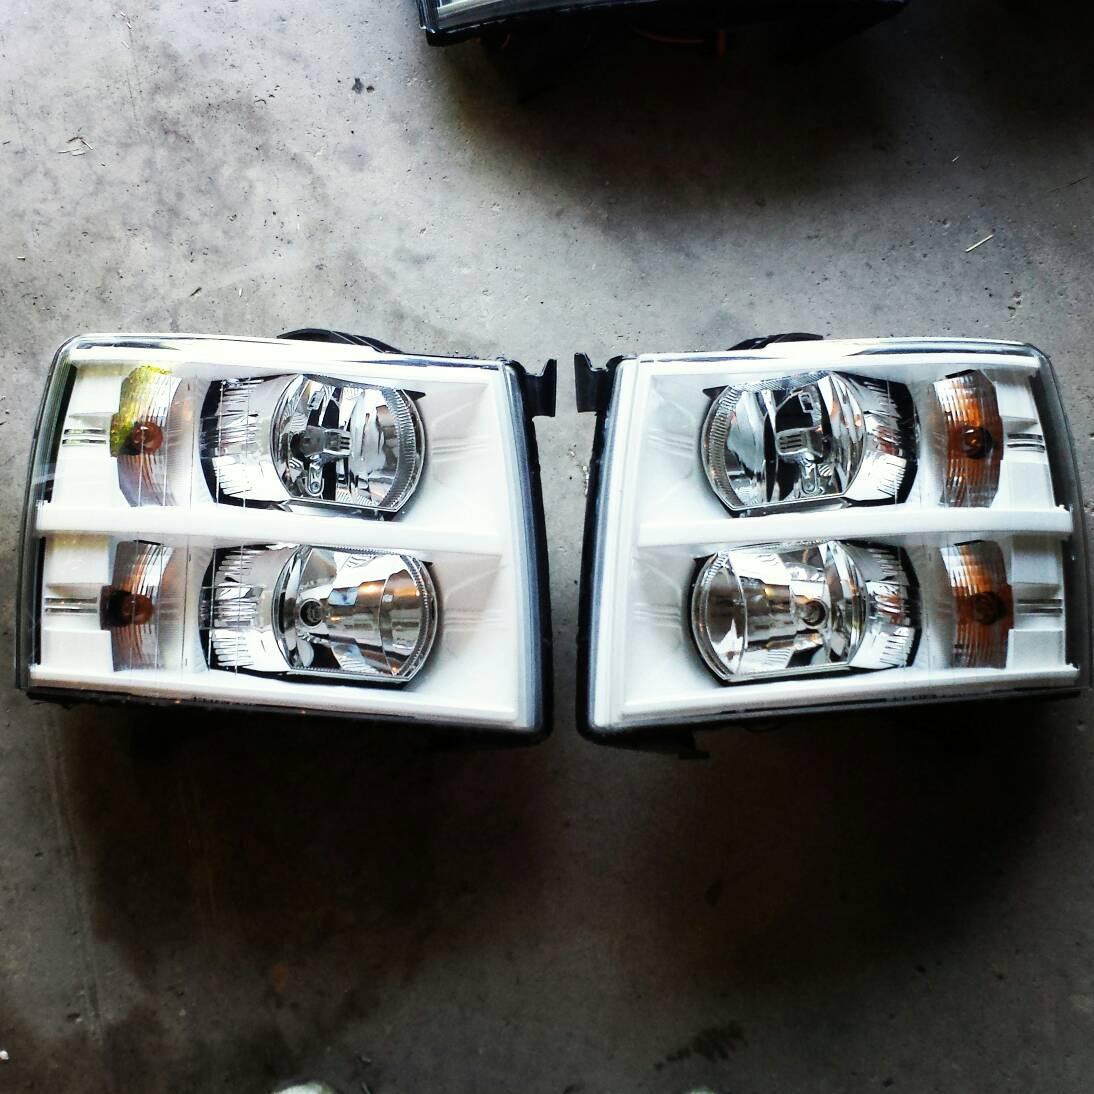 Nnbs Silverado lights for sale (custom) | Chevy Truck Forum | GMC ...